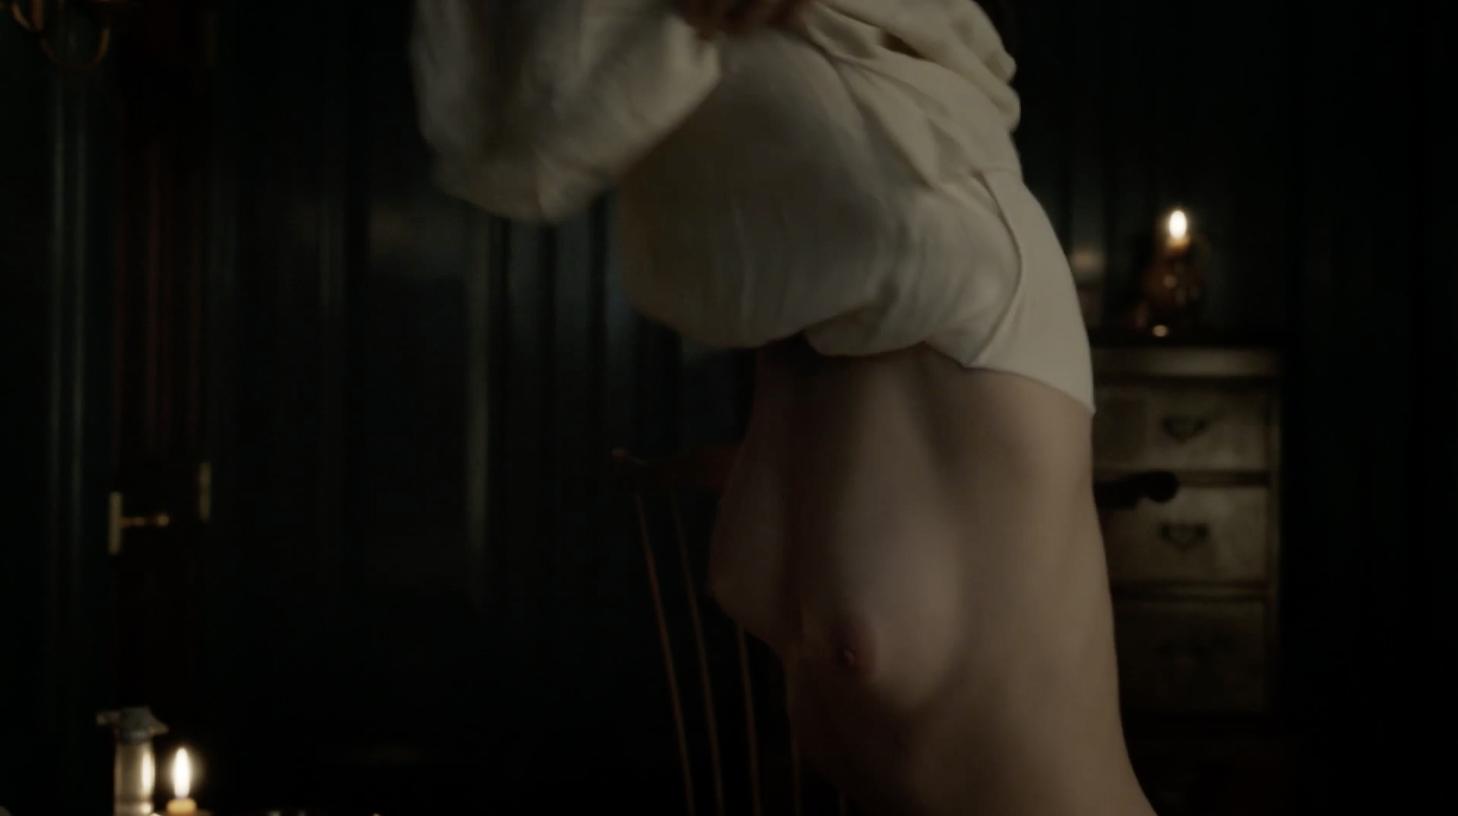 claire outlander tits